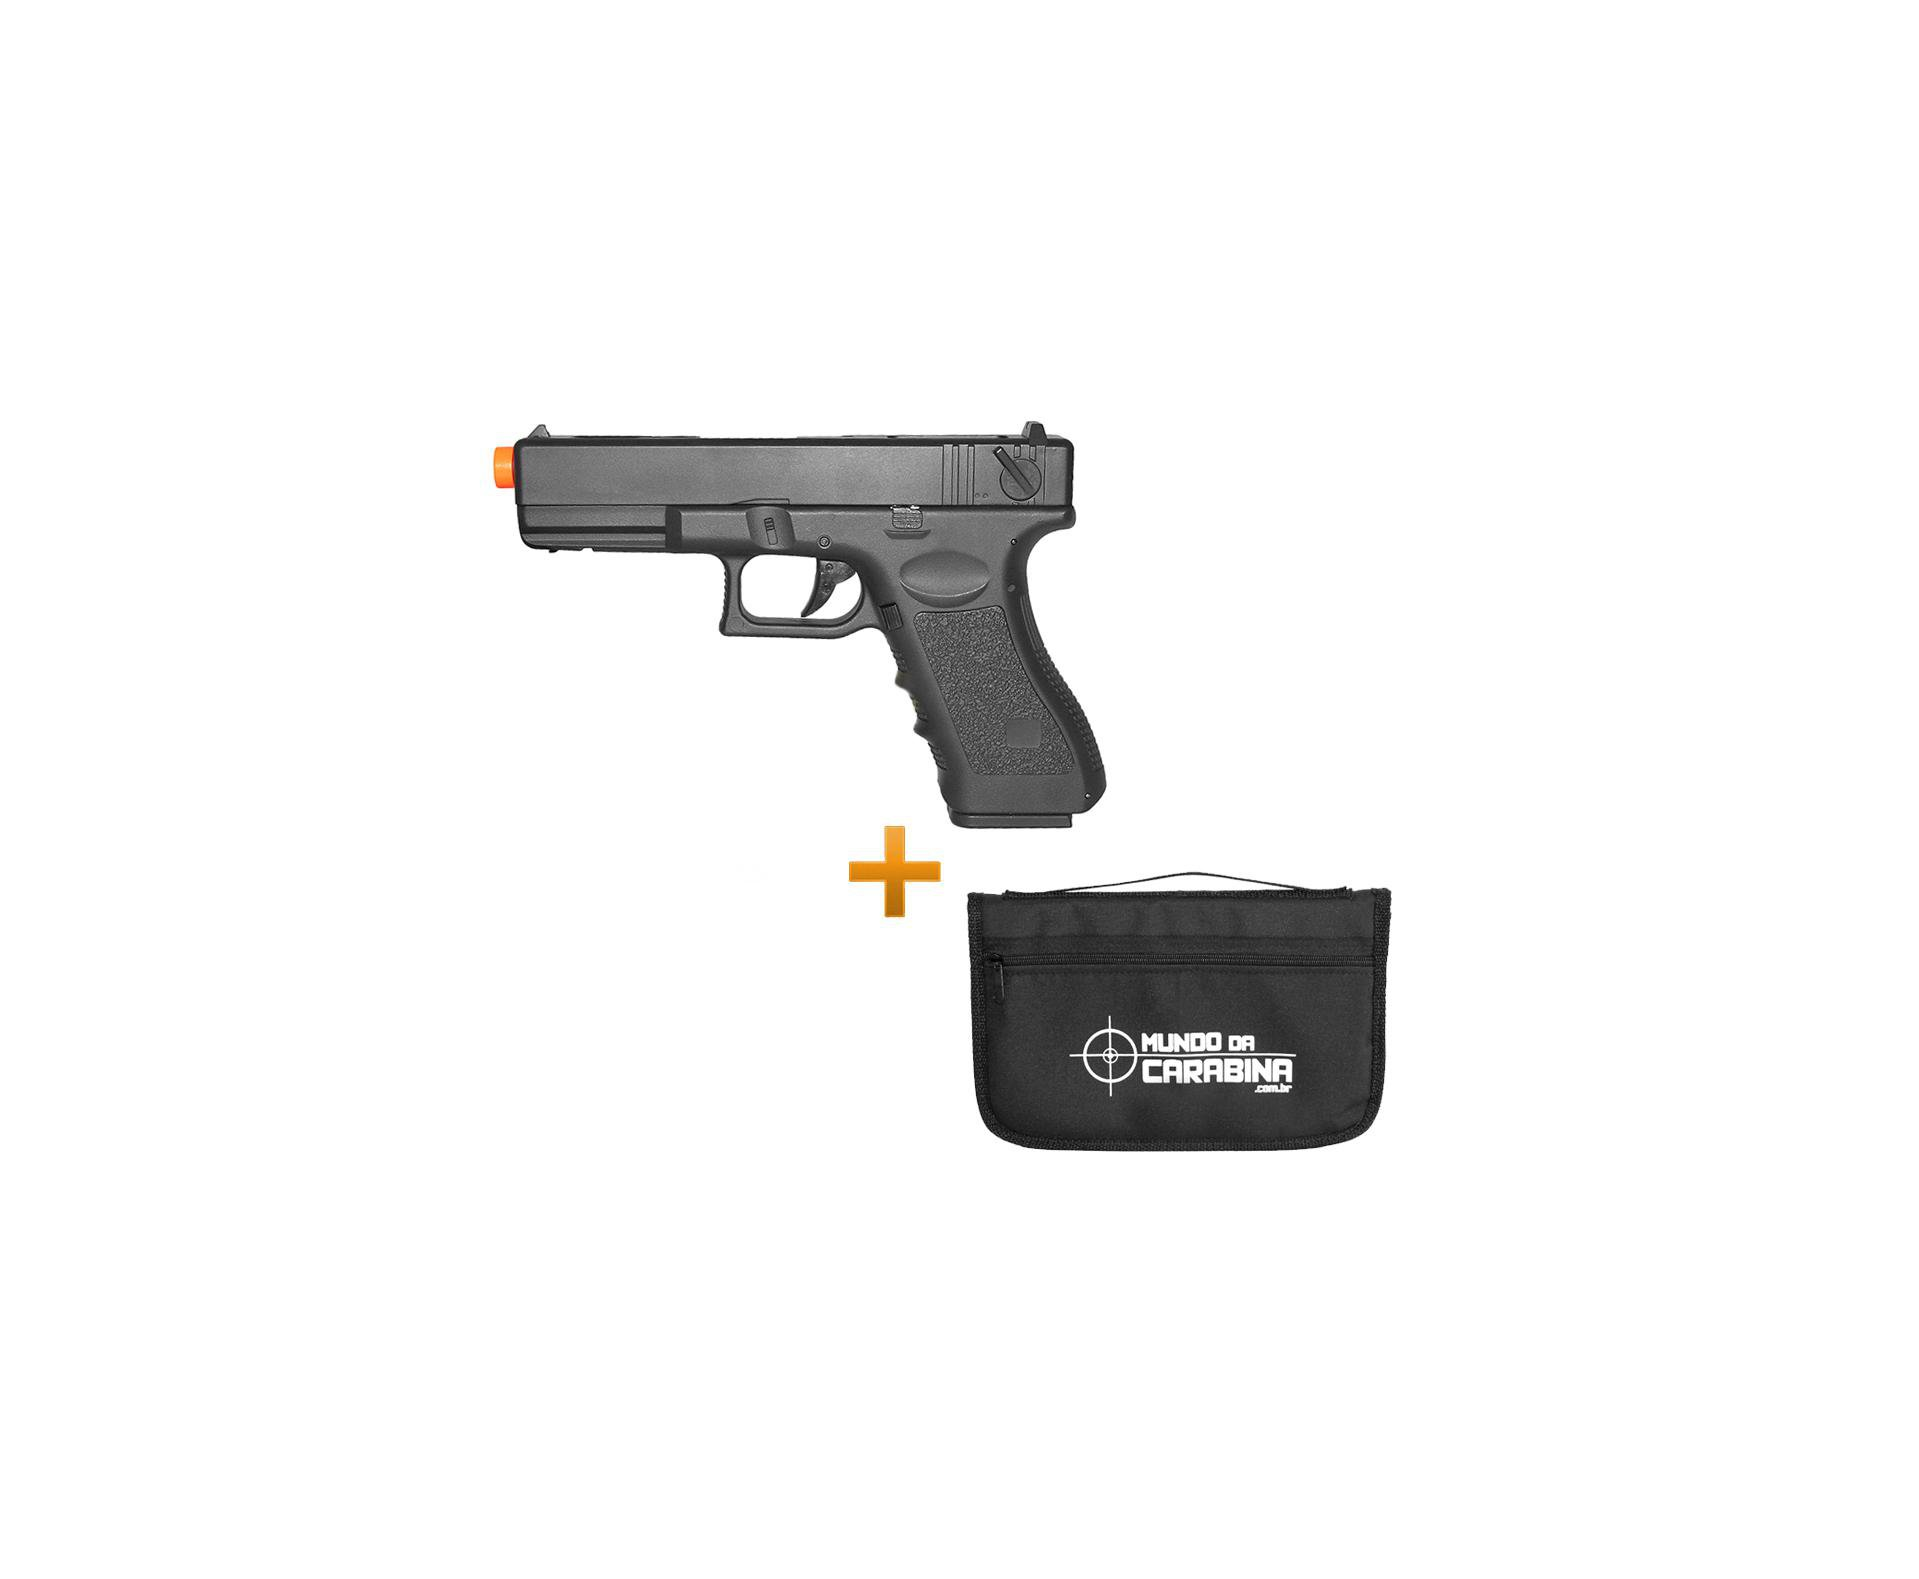 Pistola De Airsoft Eletrica Glock G18c Bivolt + Capa Especial Almofada - Cyma